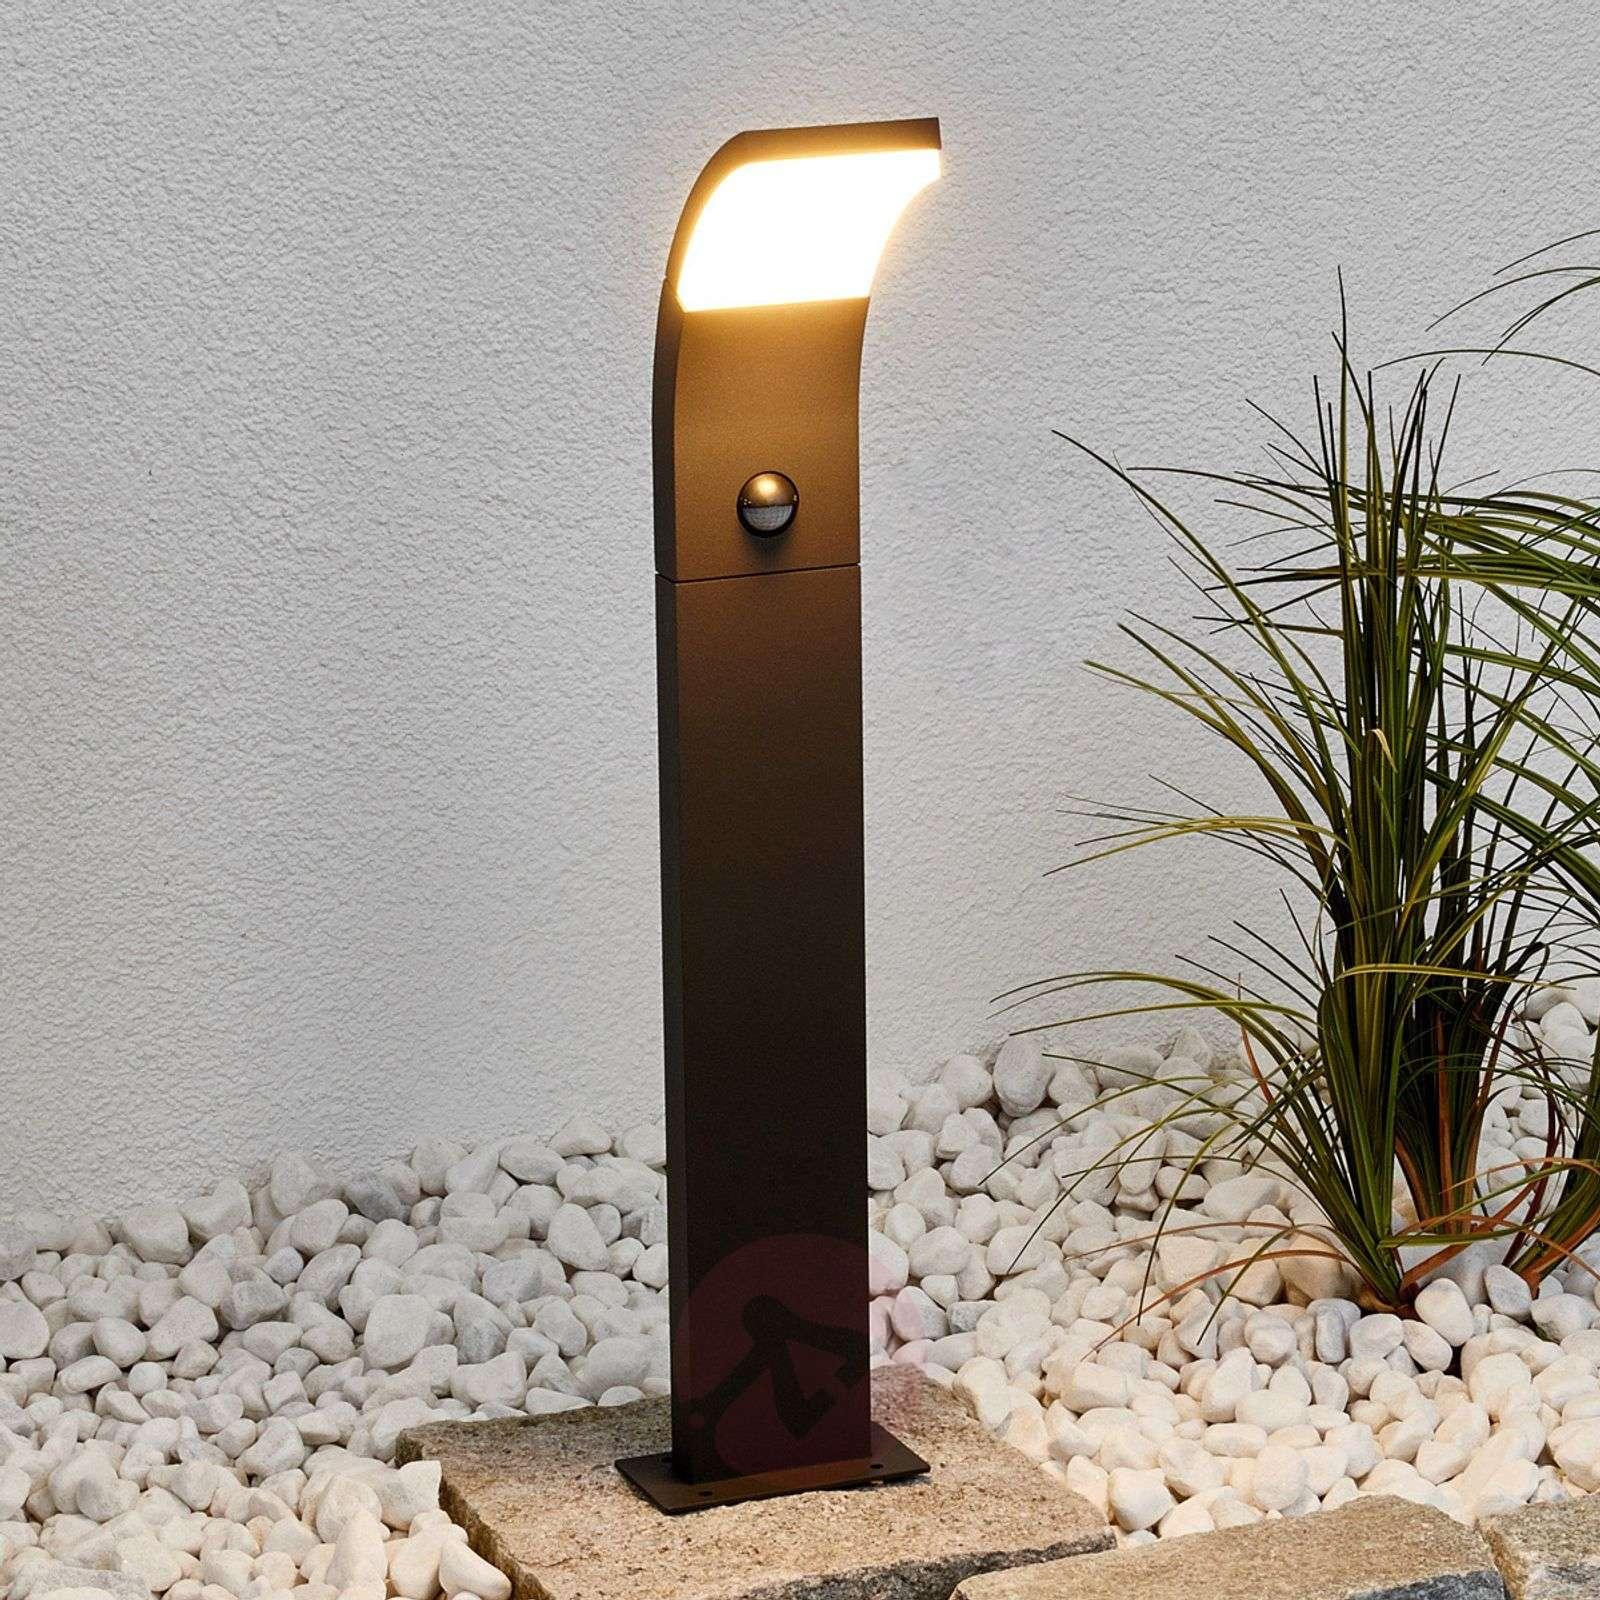 Timm – LED-pylväsvalaisin, liiketunnistin, 60cm-9619052-02